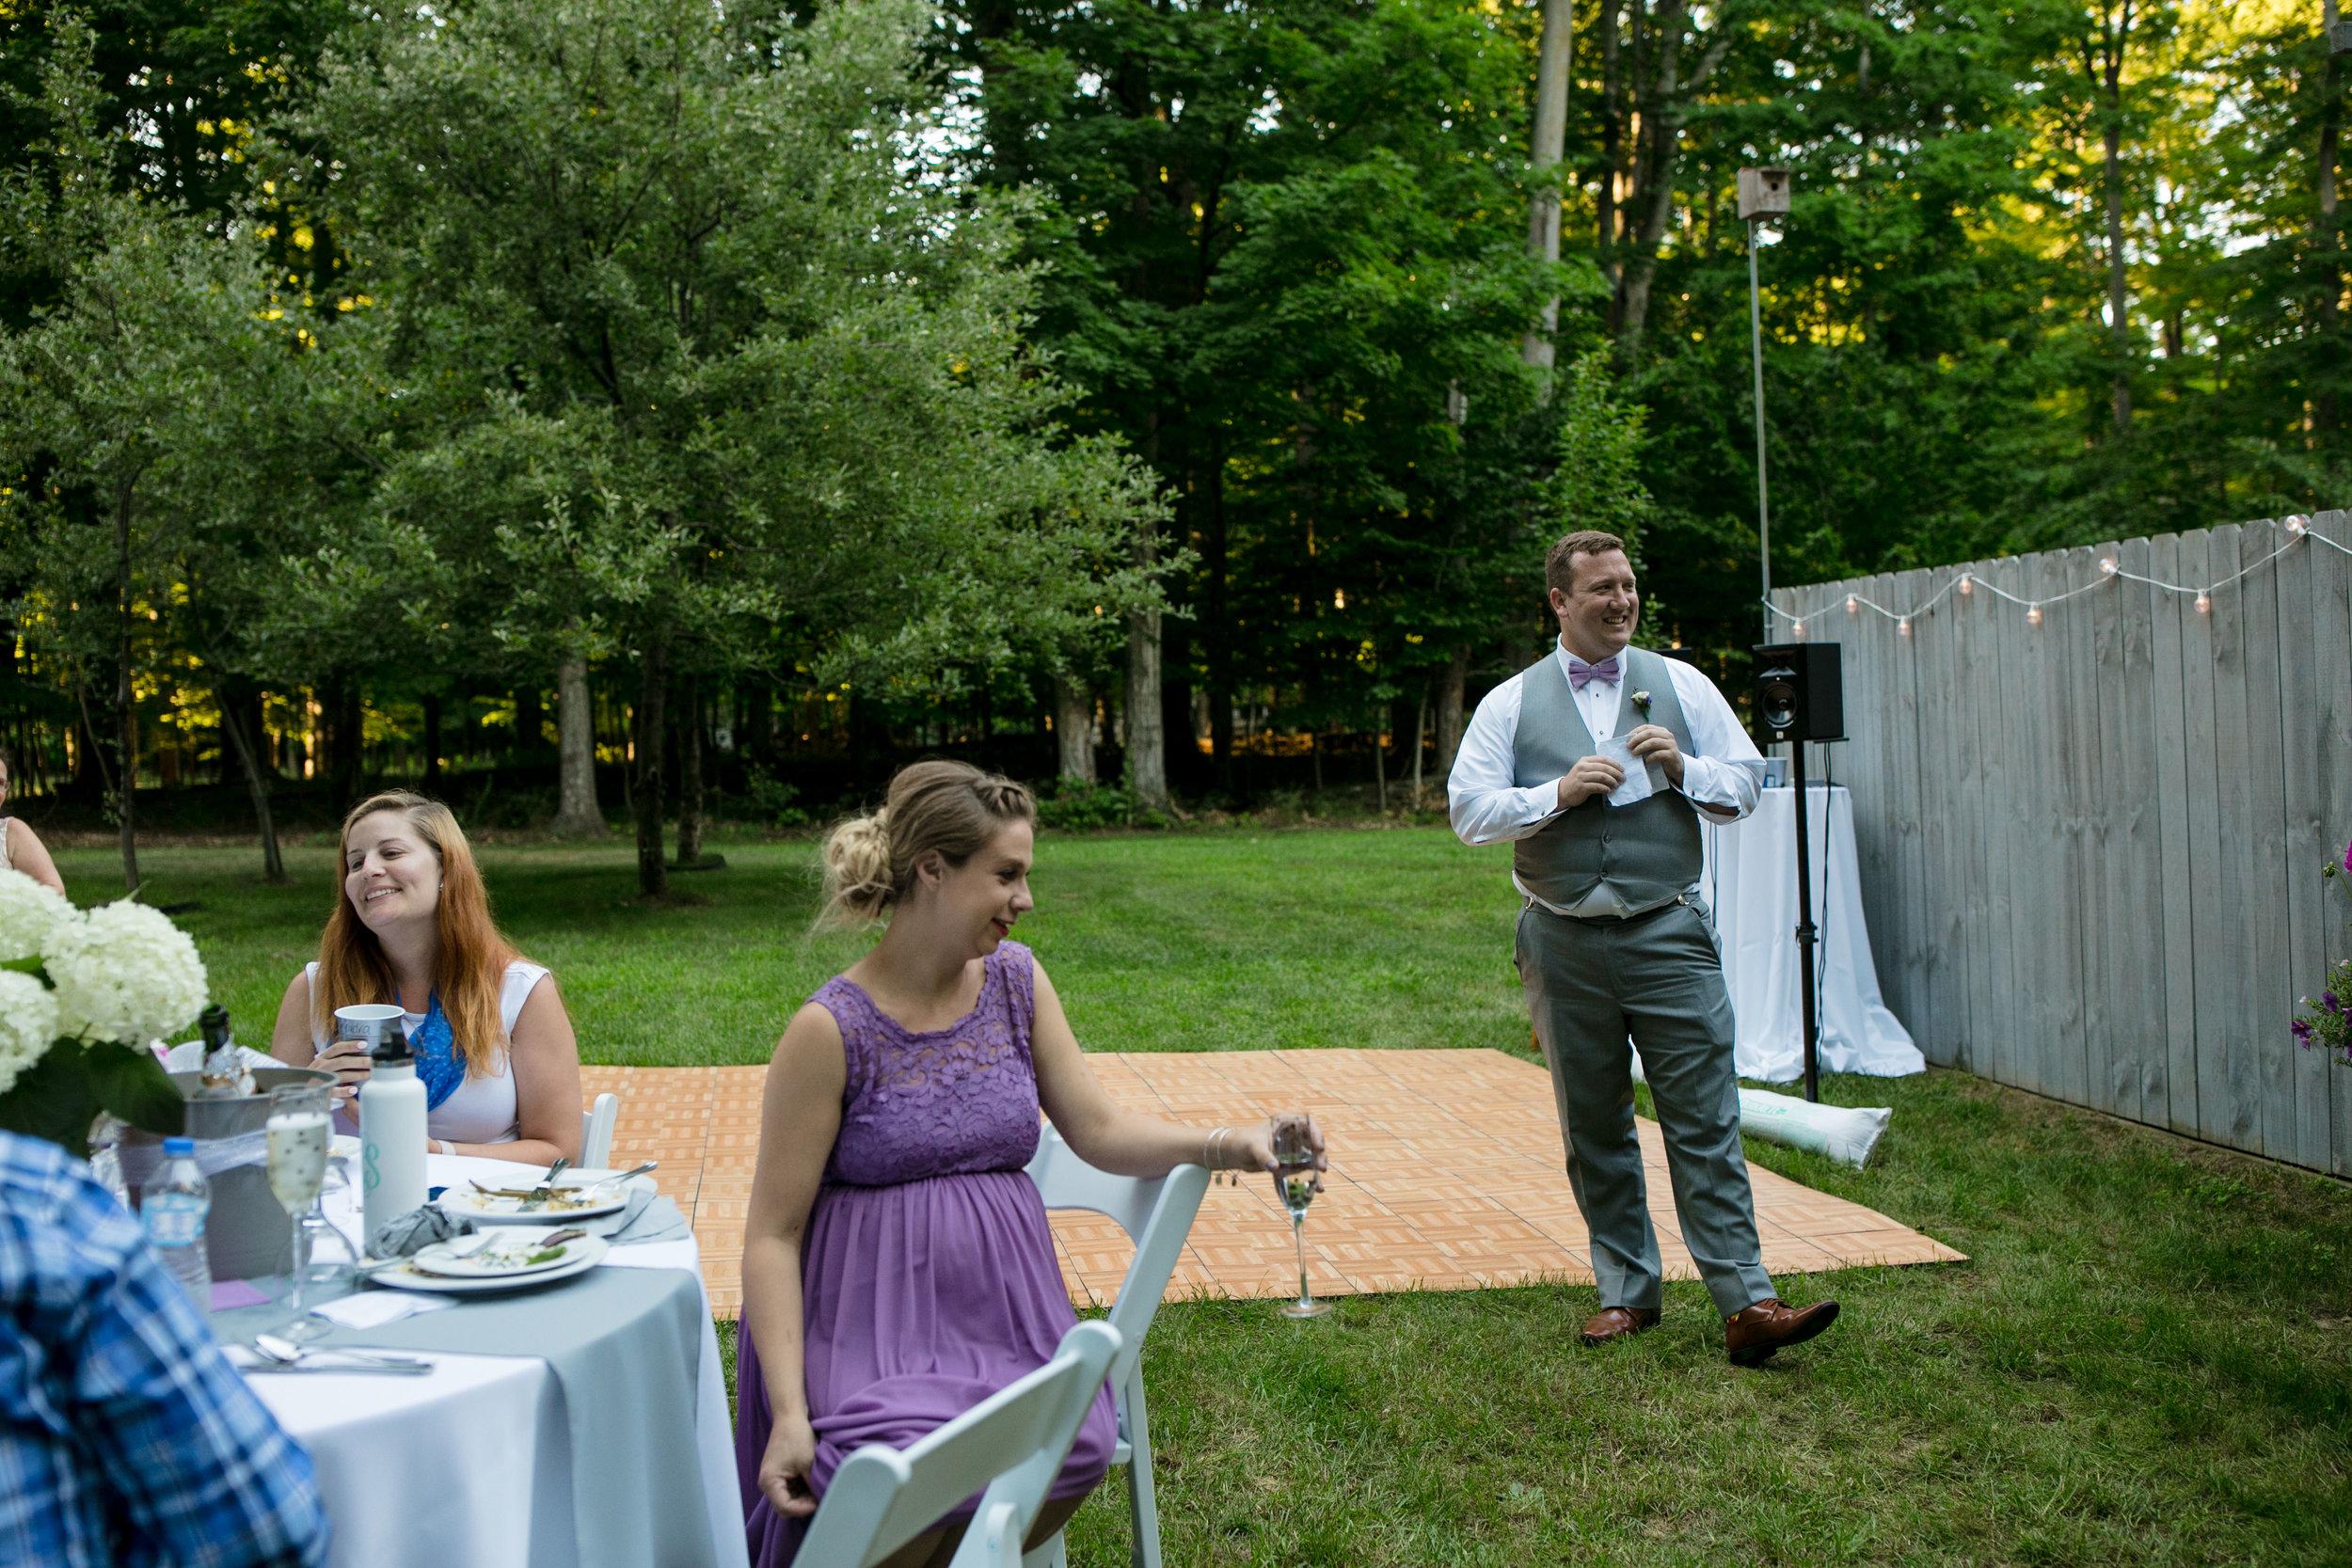 ludington-michigan-intimate-backyard-wedding-jessica-nolan422.jpg